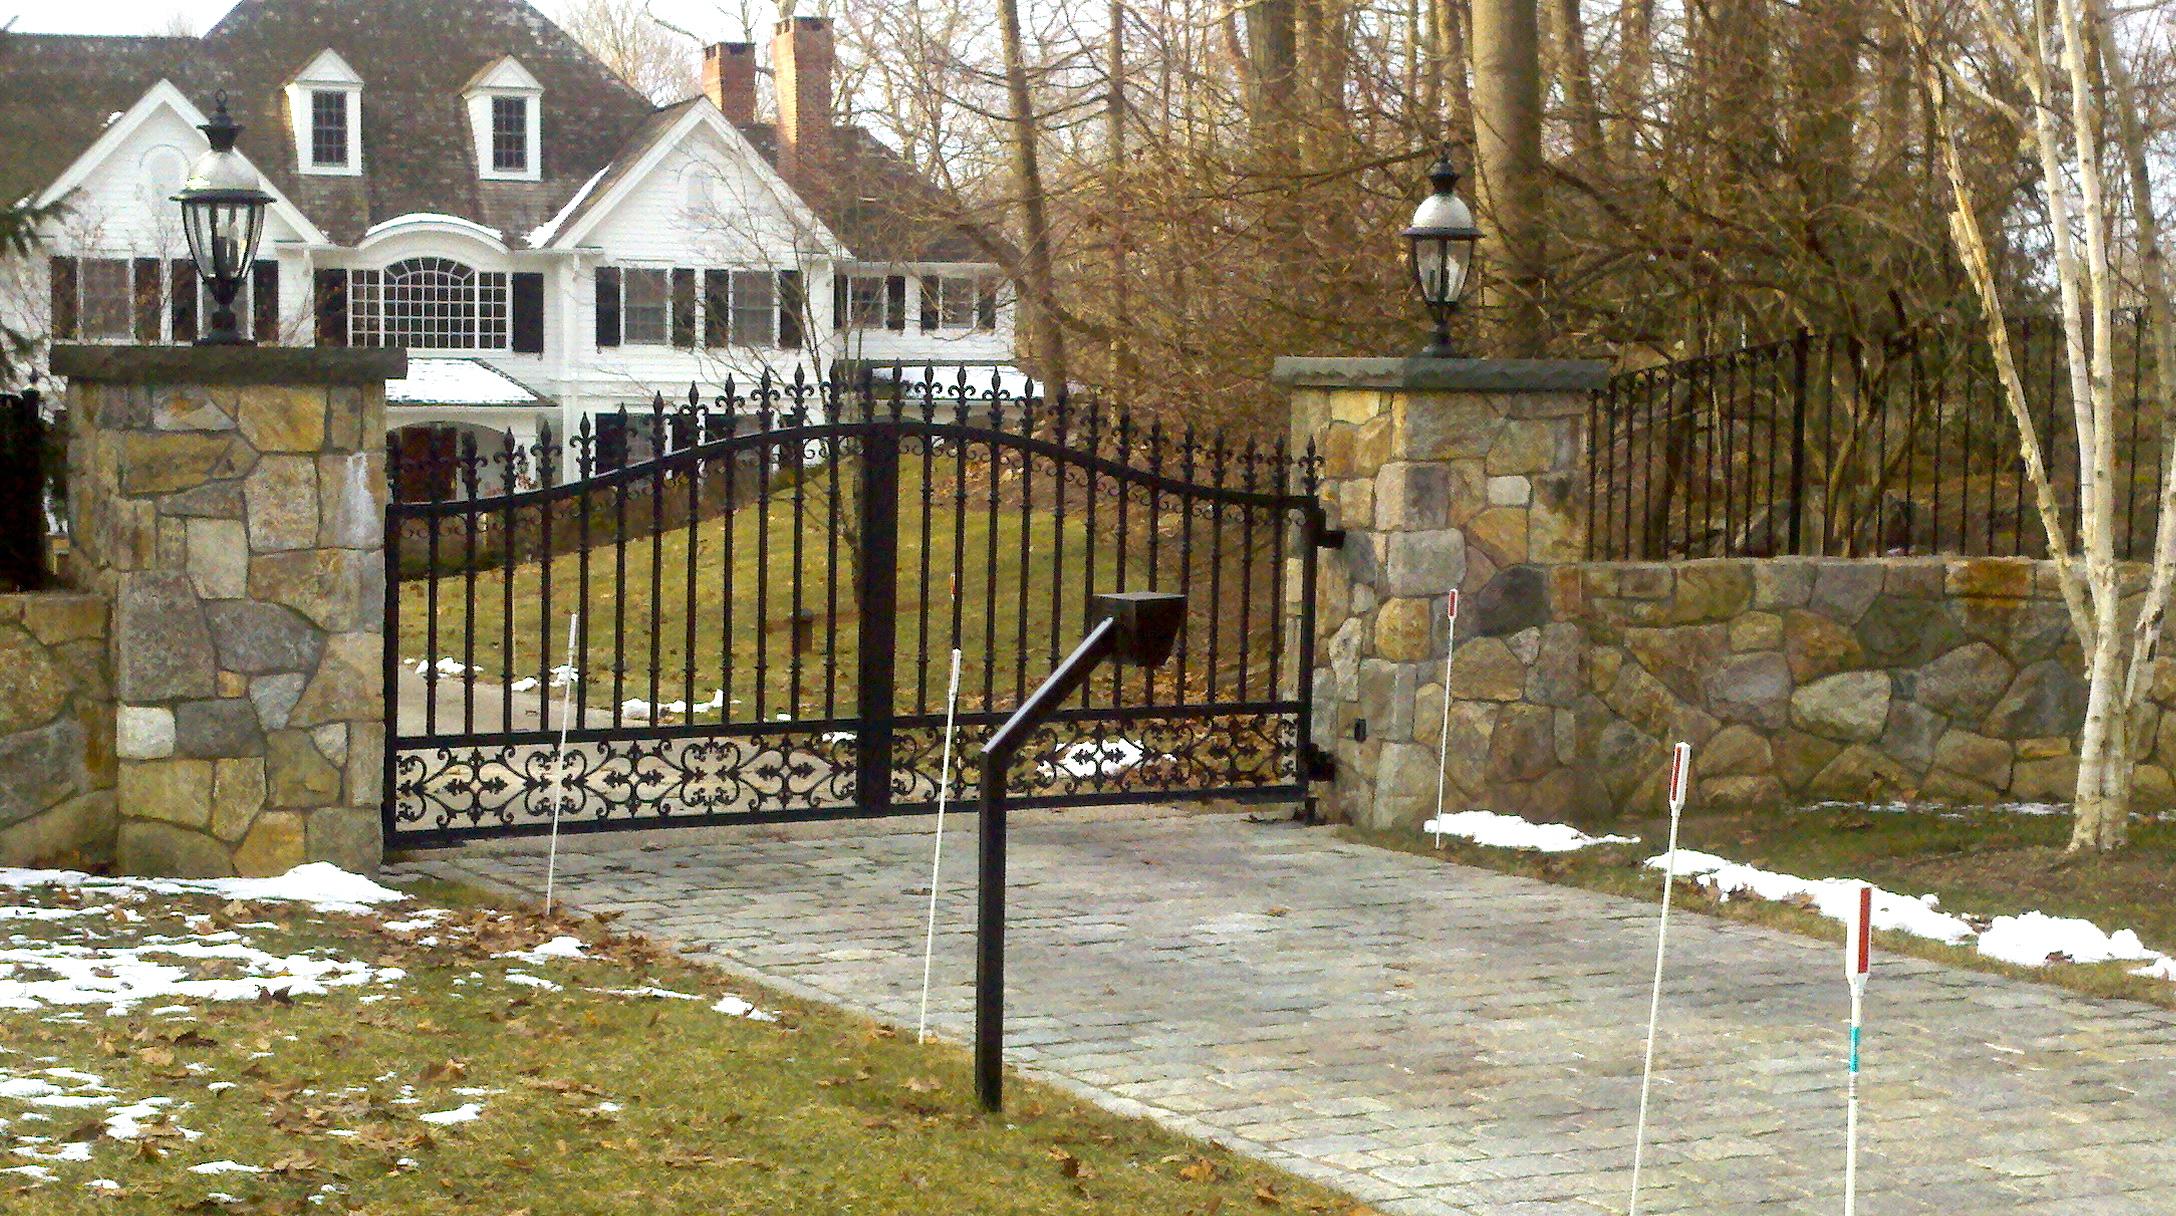 Red Fox Fence Ornamental Iron Gate